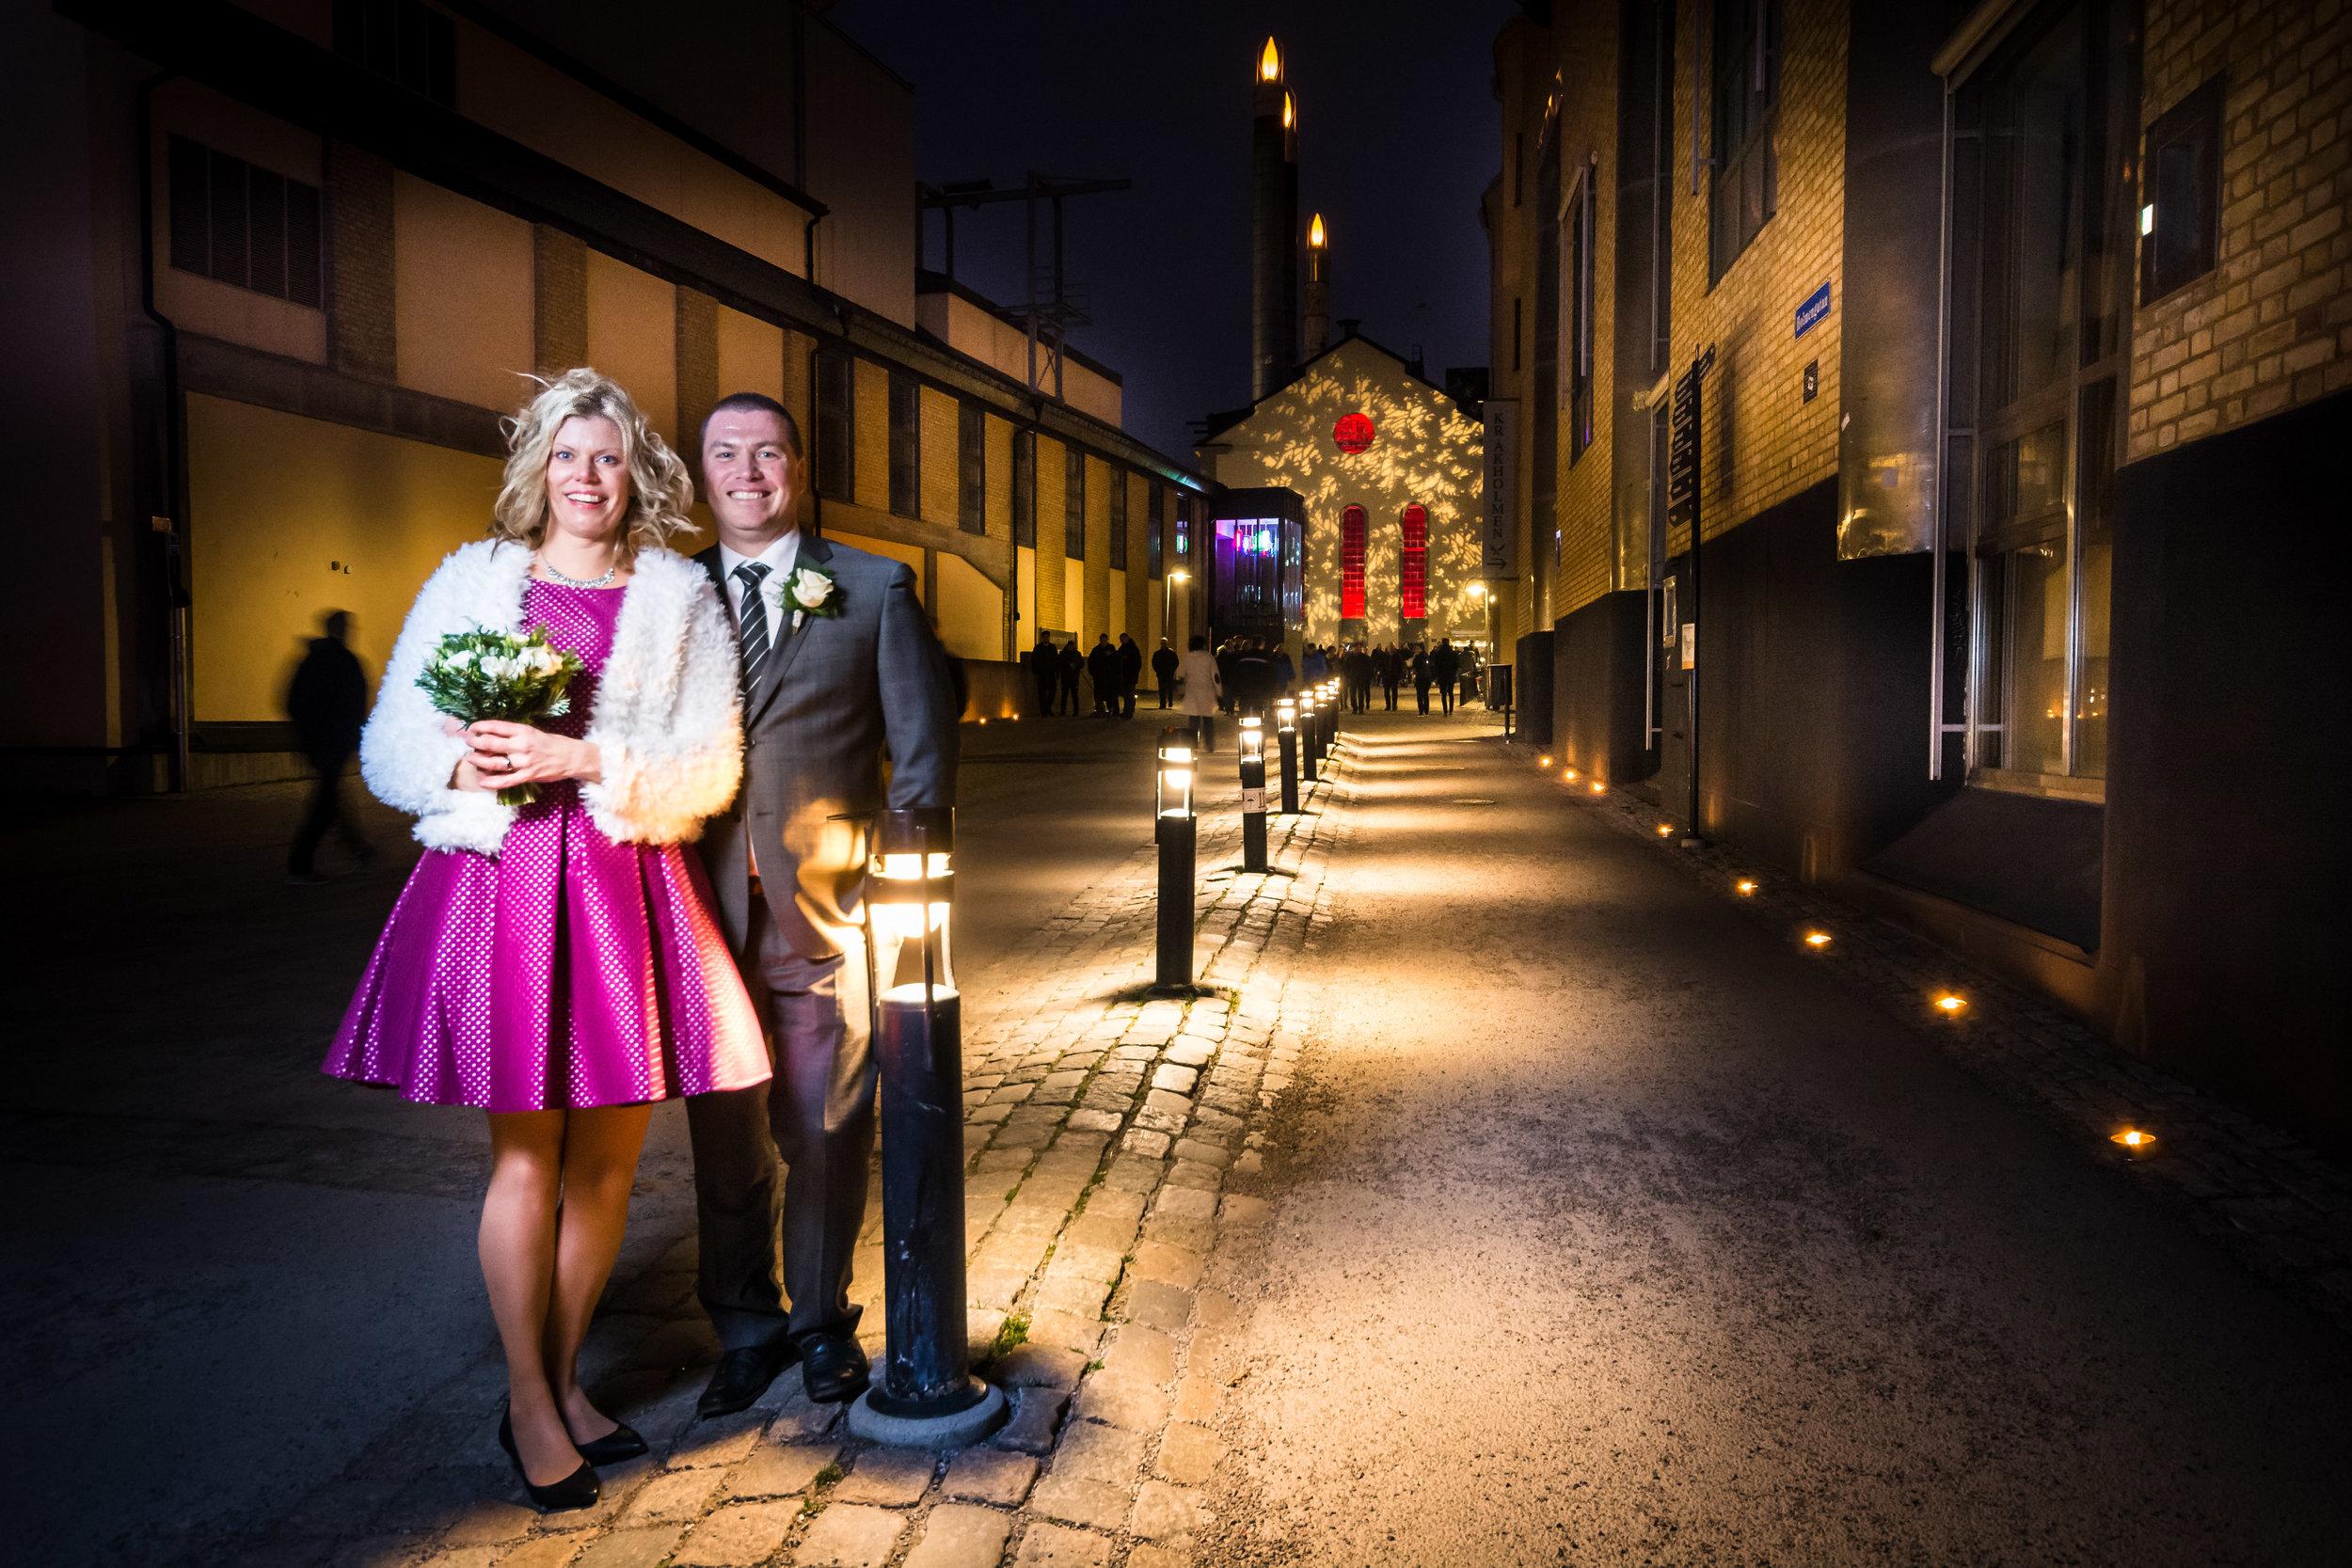 Bröllop-6.jpg